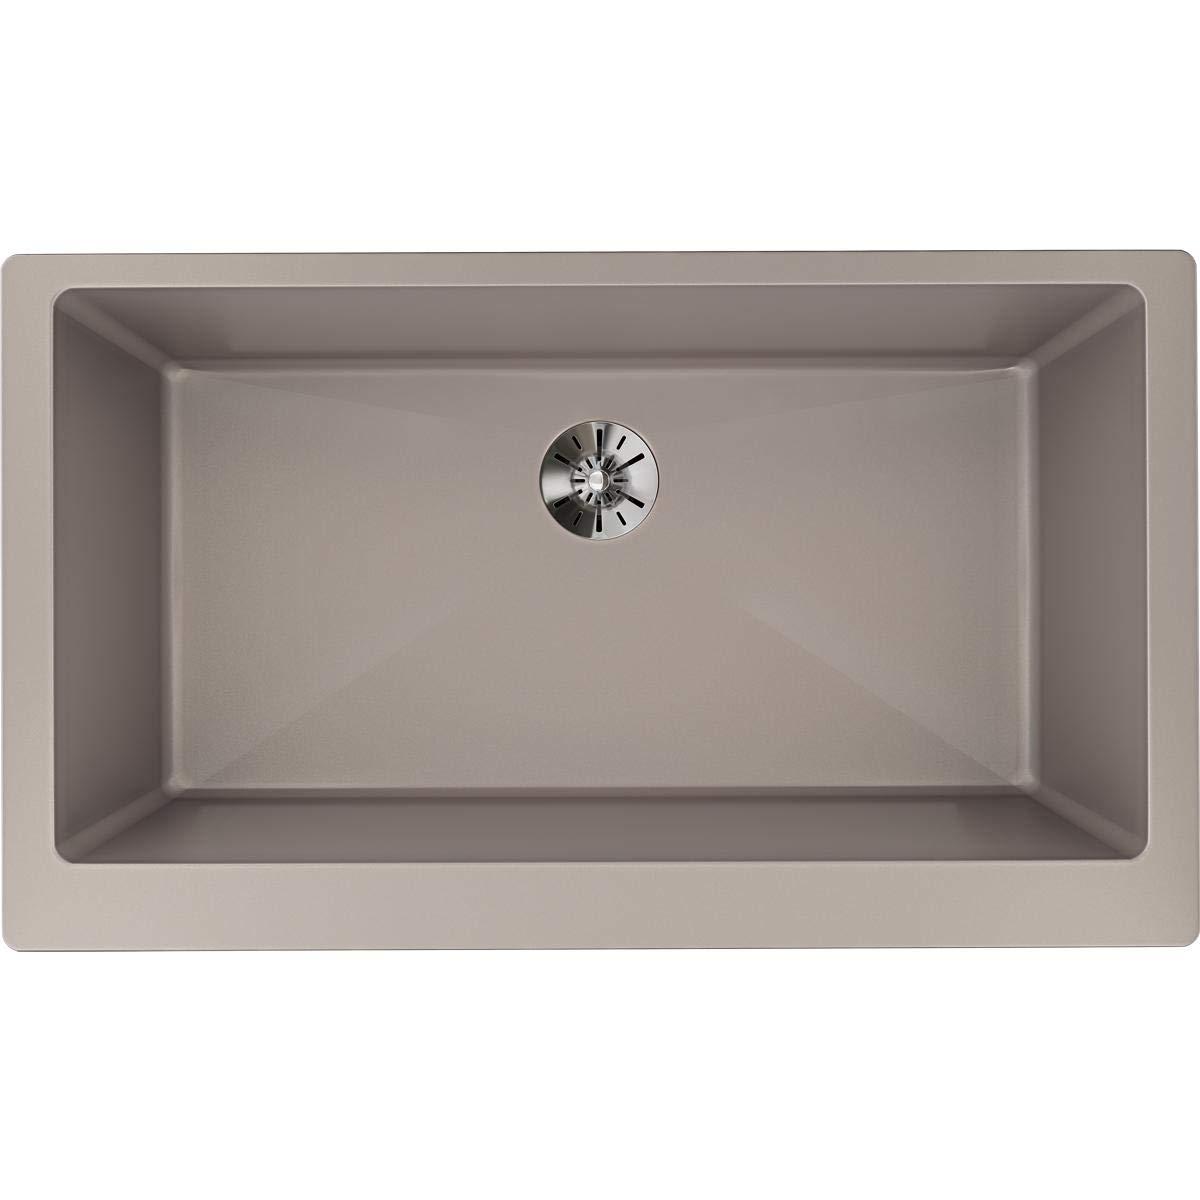 Elkay ELXUFP3620SM0 Quartz Luxe Single Bowl Farmhouse Sink with Perfect Drain, Silvermist